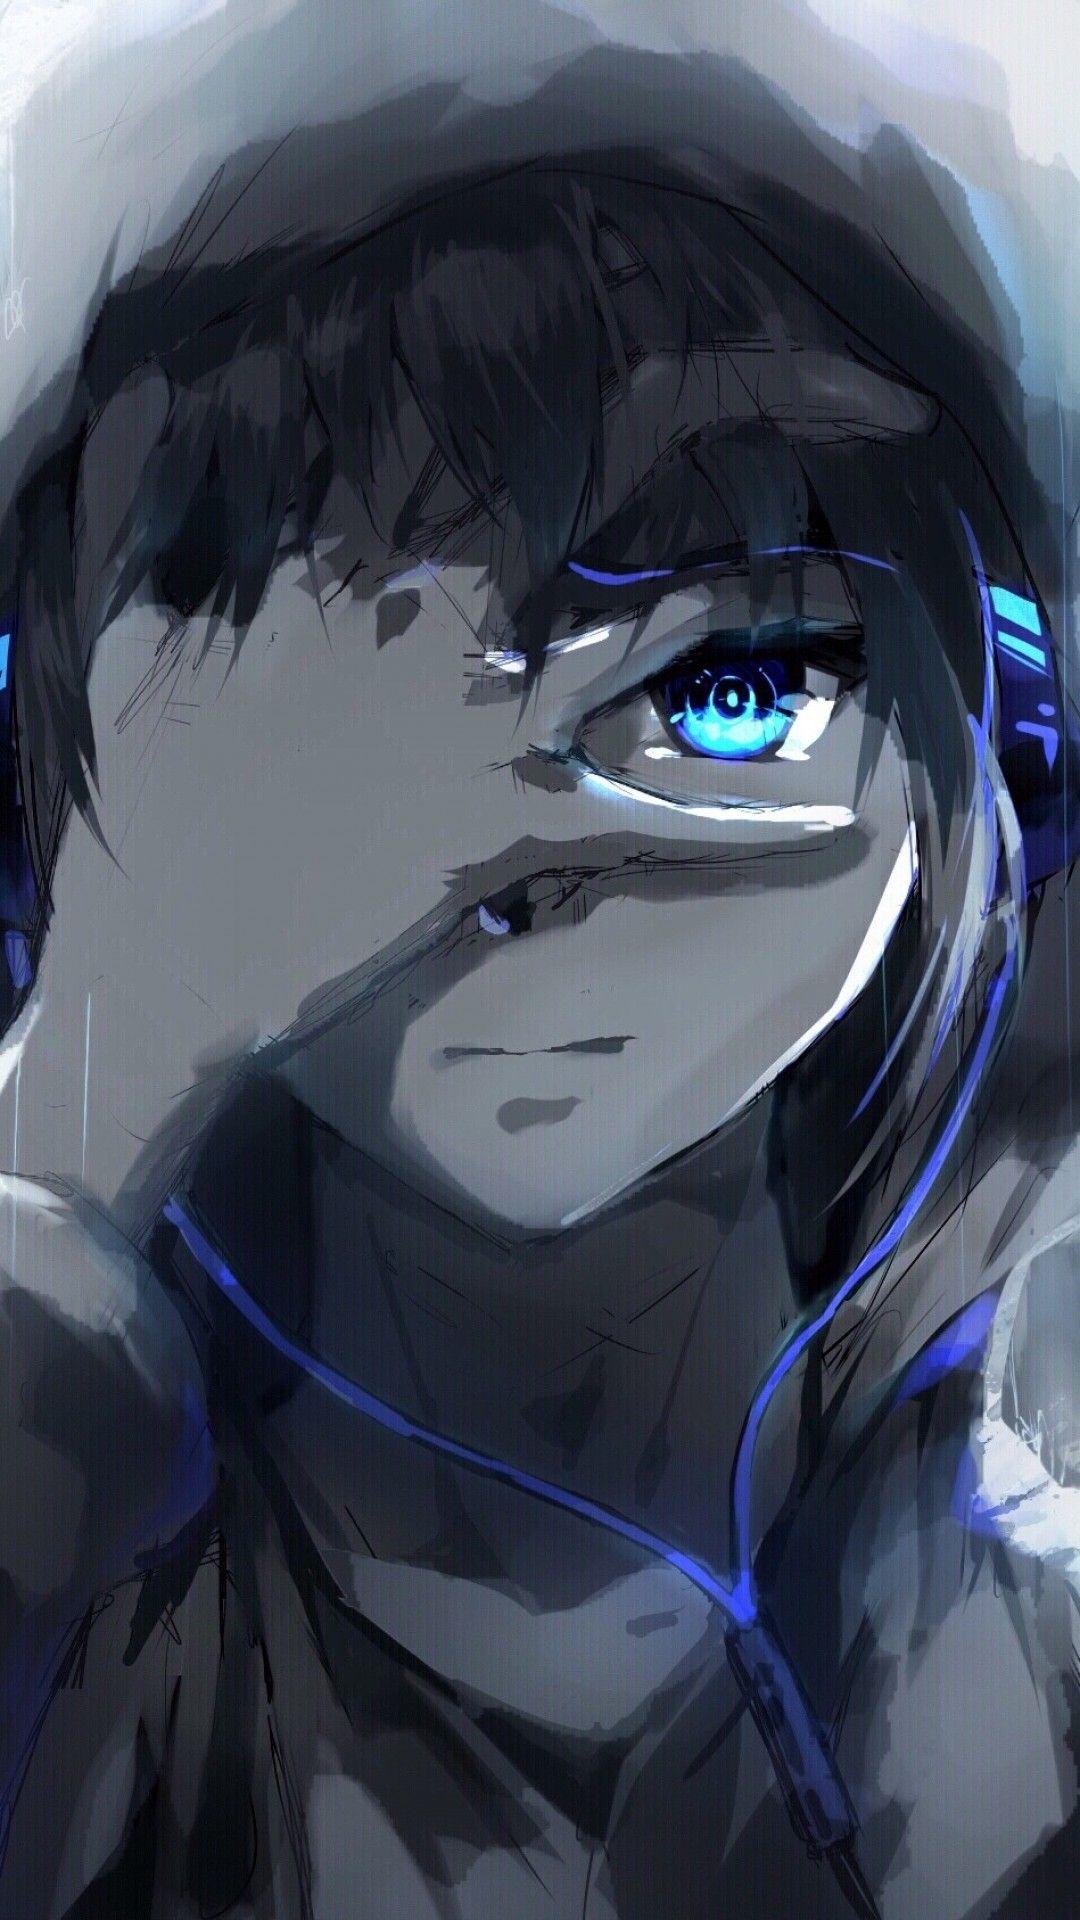 Anime Boy Hoodie Blue Eyes Headphones Painting Cool Anime Guys Blue Anime Anime